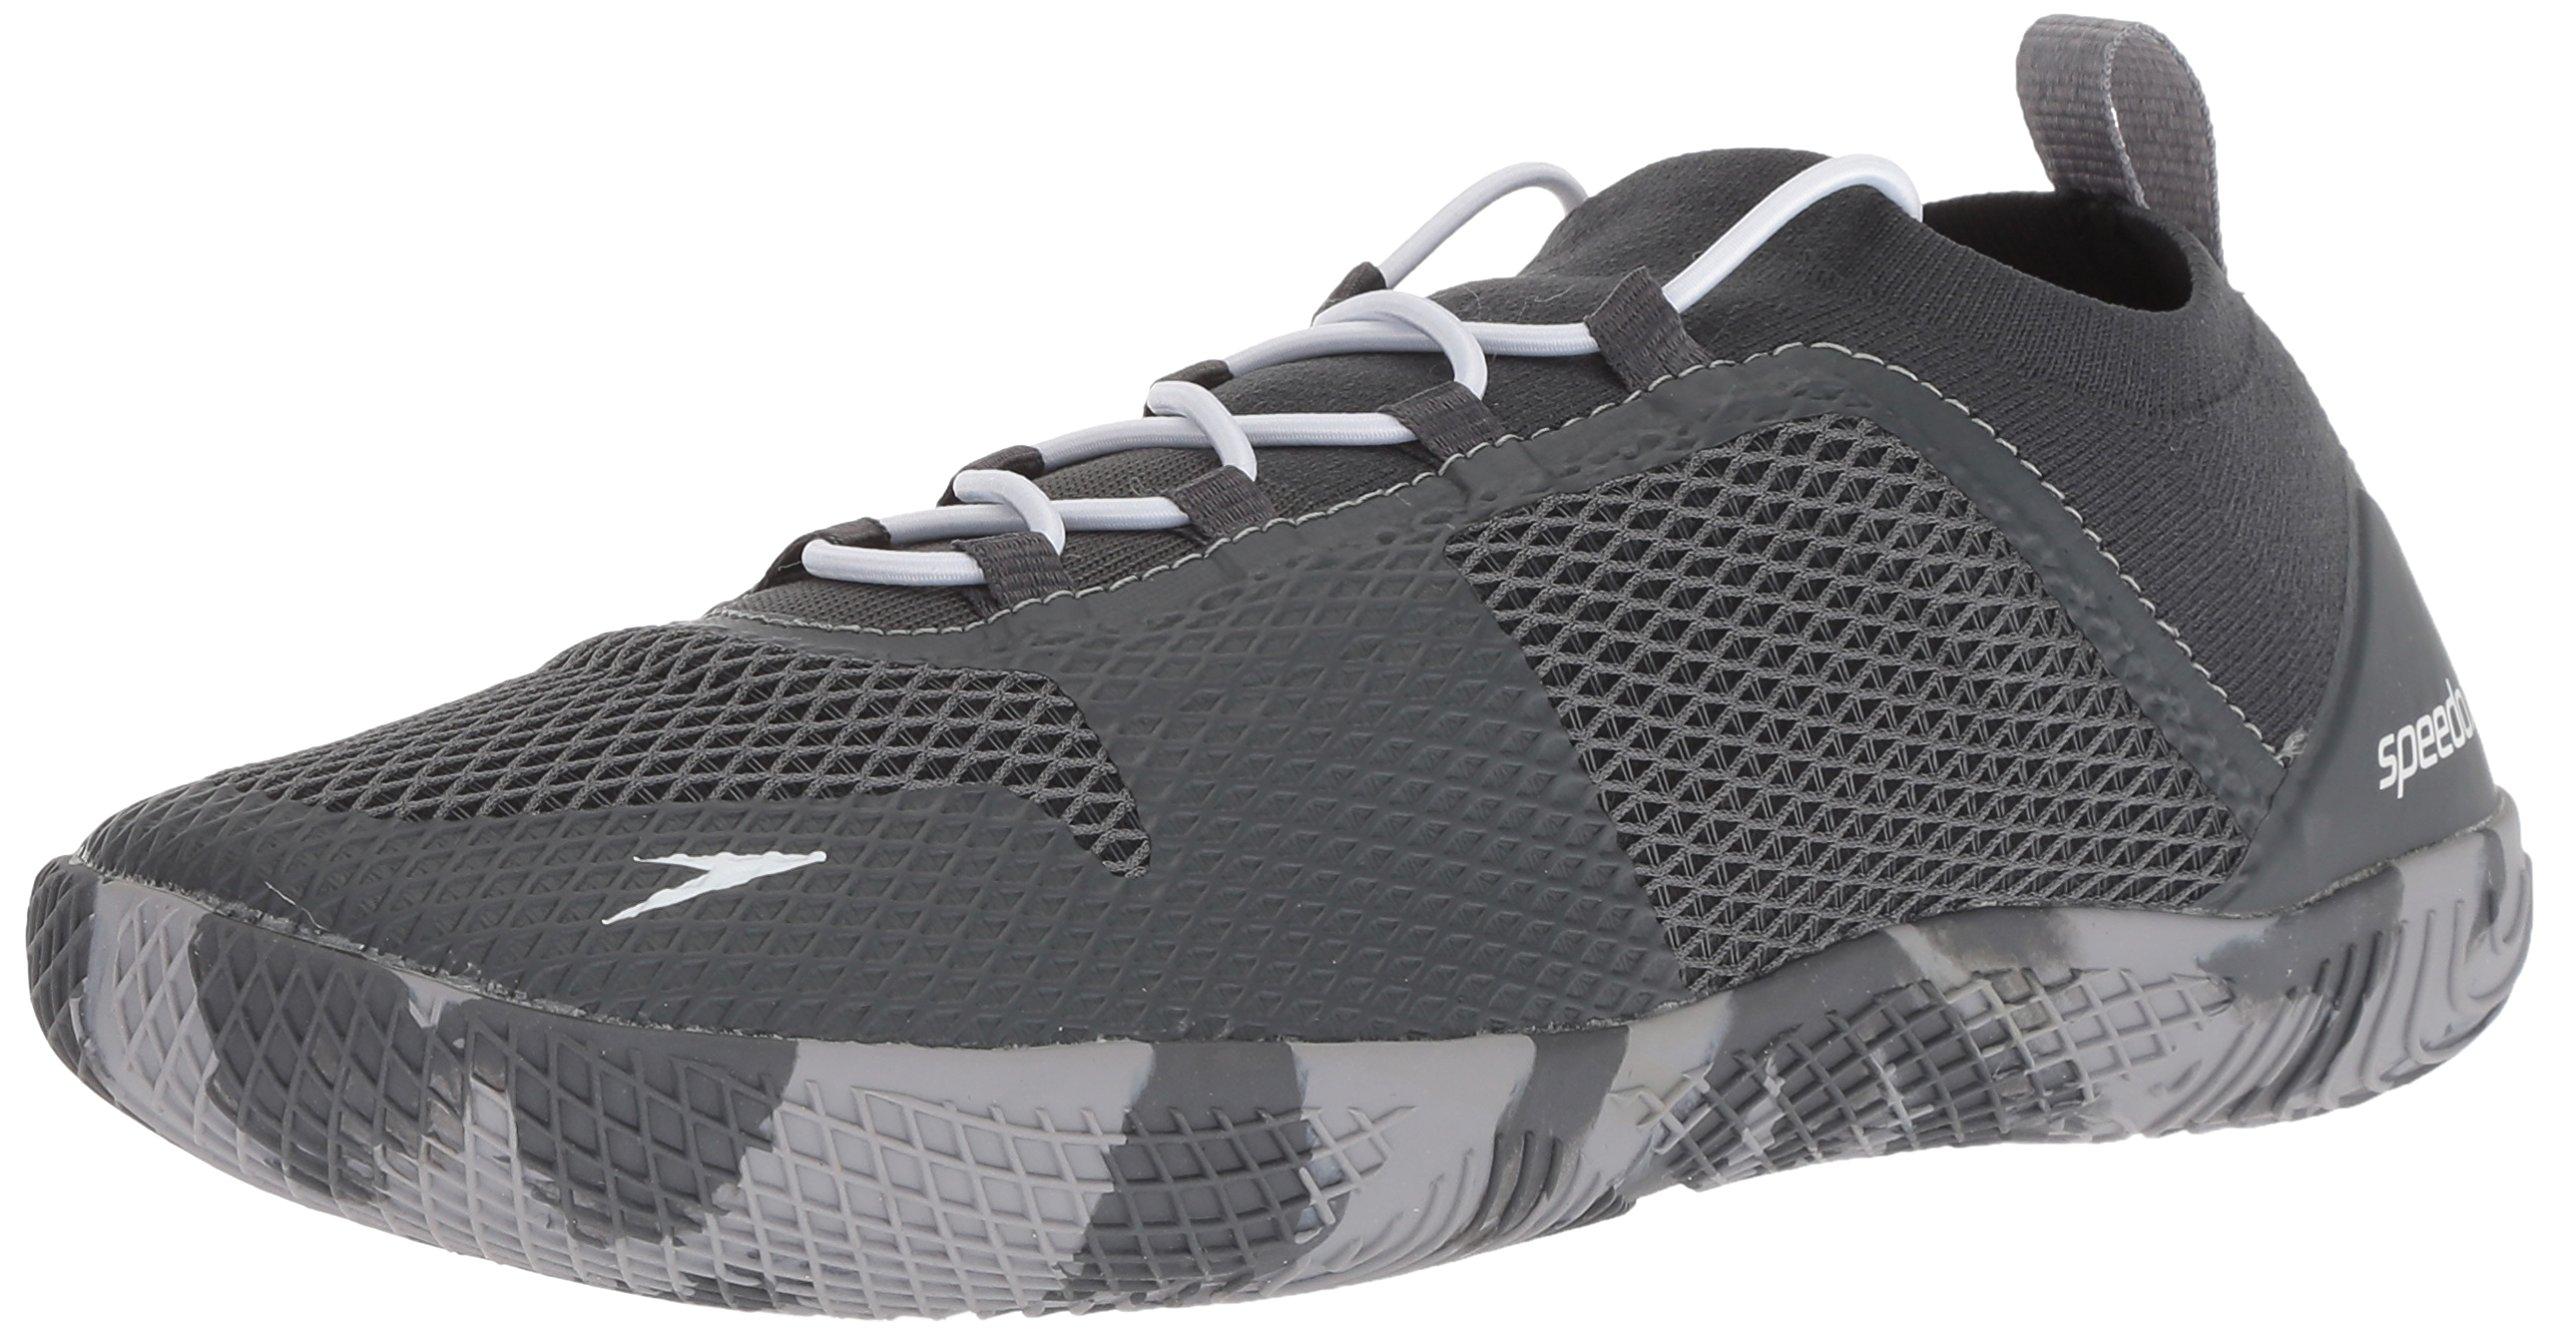 Speedo Men's Fathom AQ Fitness Water Shoes, Dark Heather Grey, 10H US